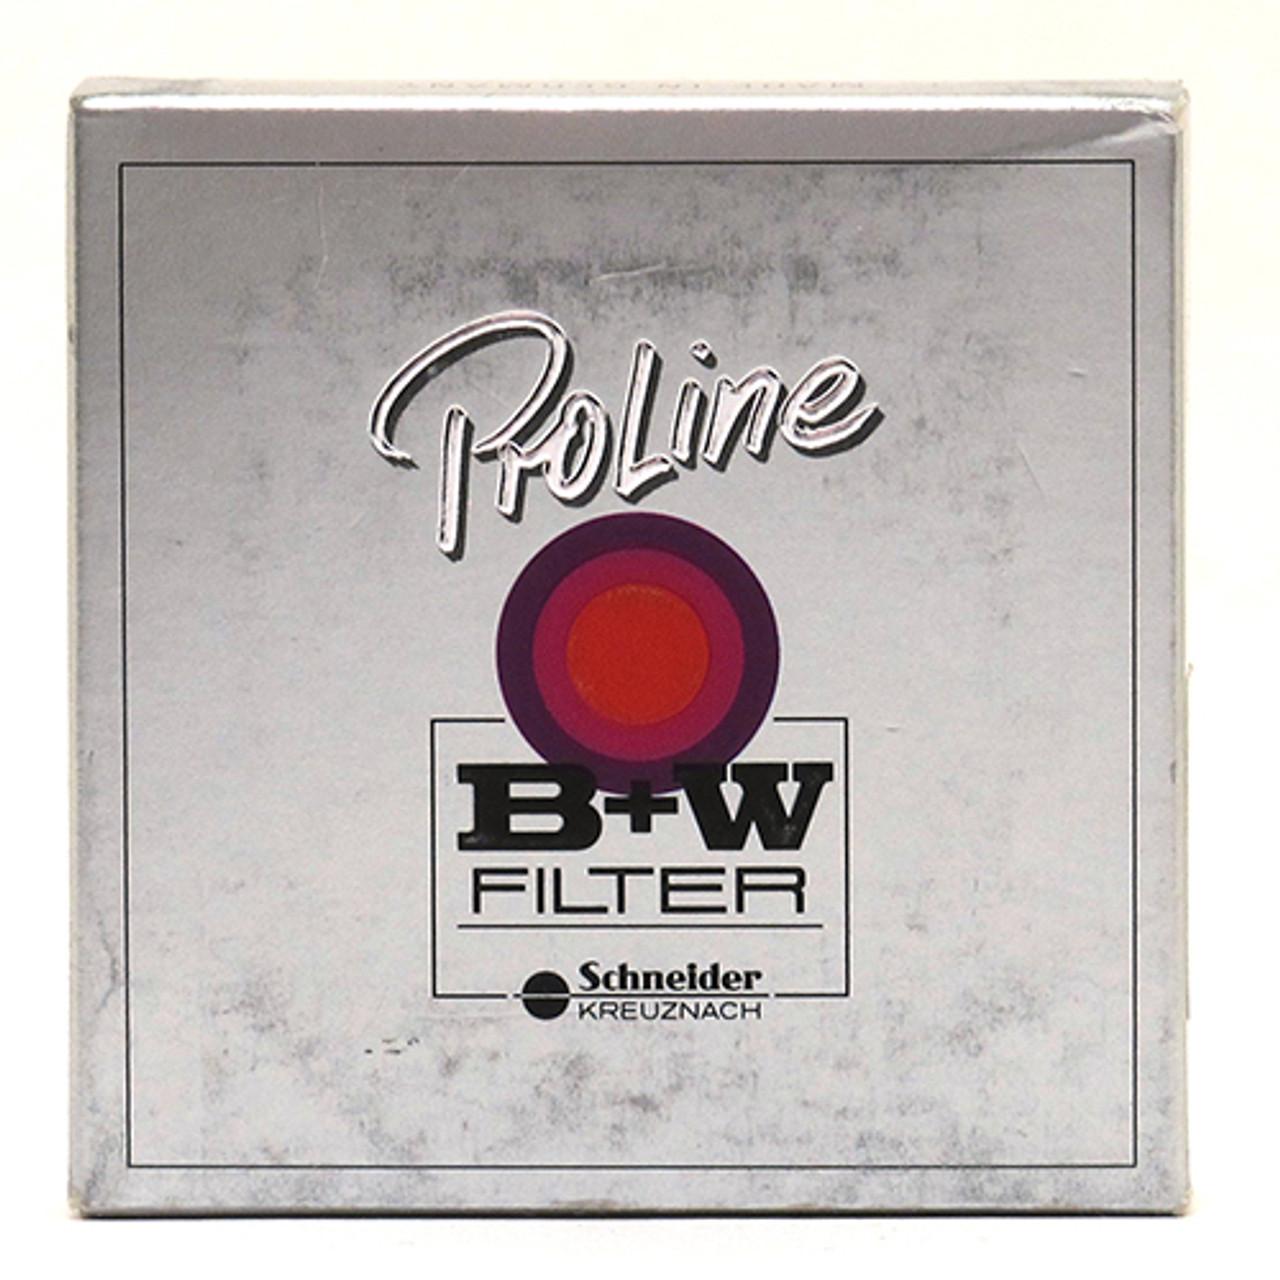 B+W CLOSE-UP +10 SC NL (55MM)